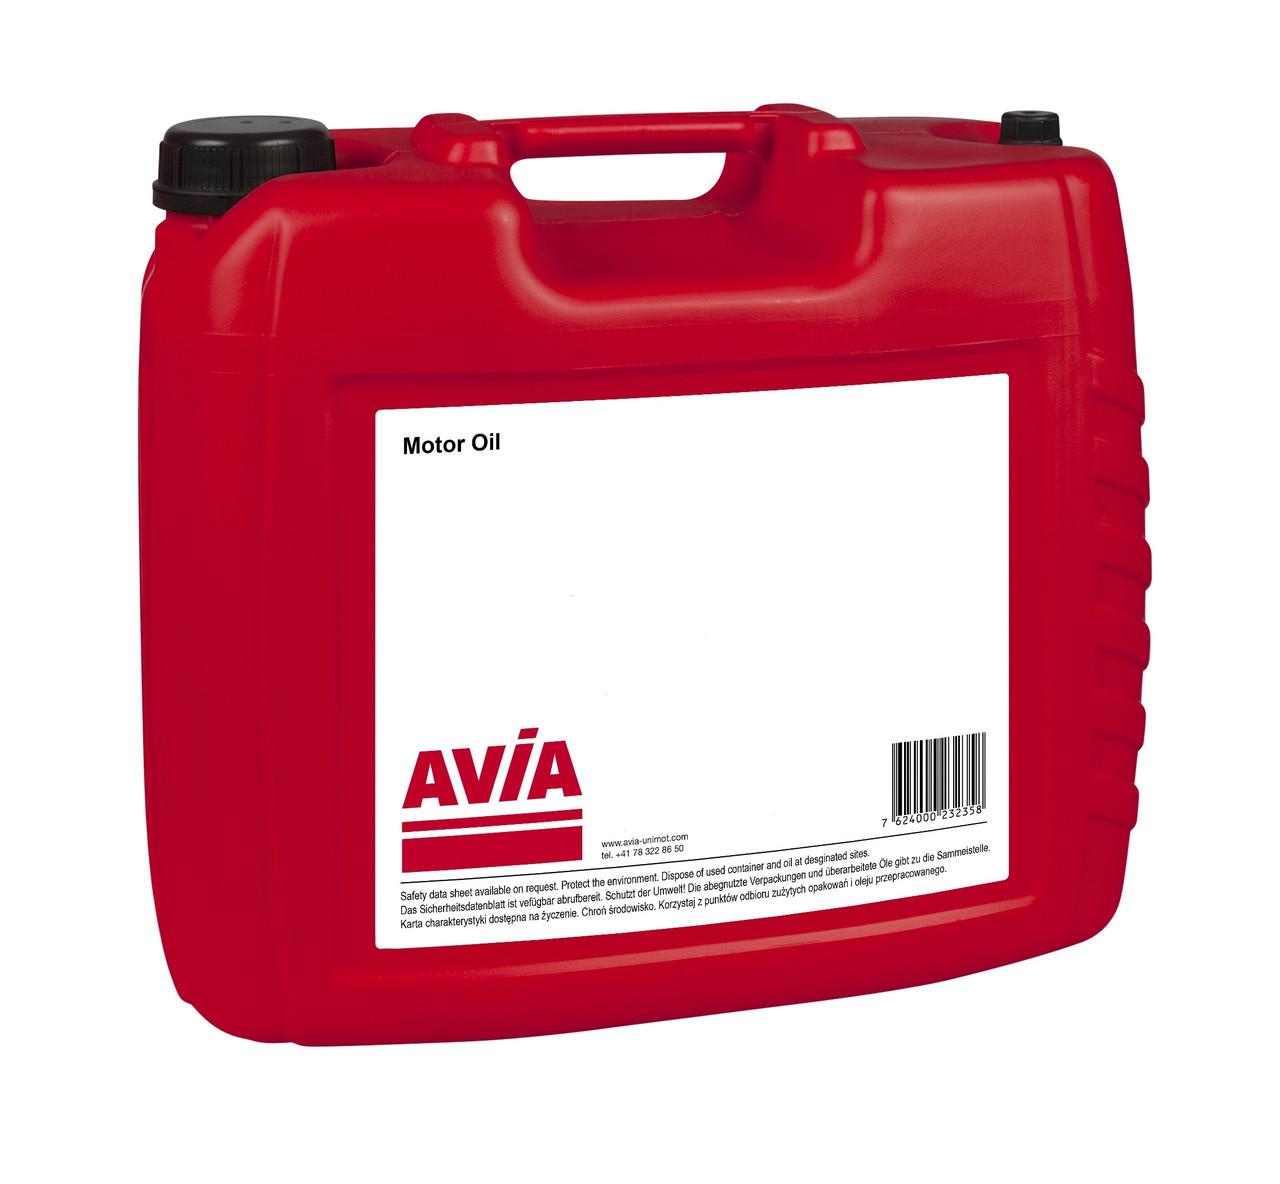 Масло AVIA TURBOSYNTH Extra HD01 5W30 CJ-4 Plus 20л